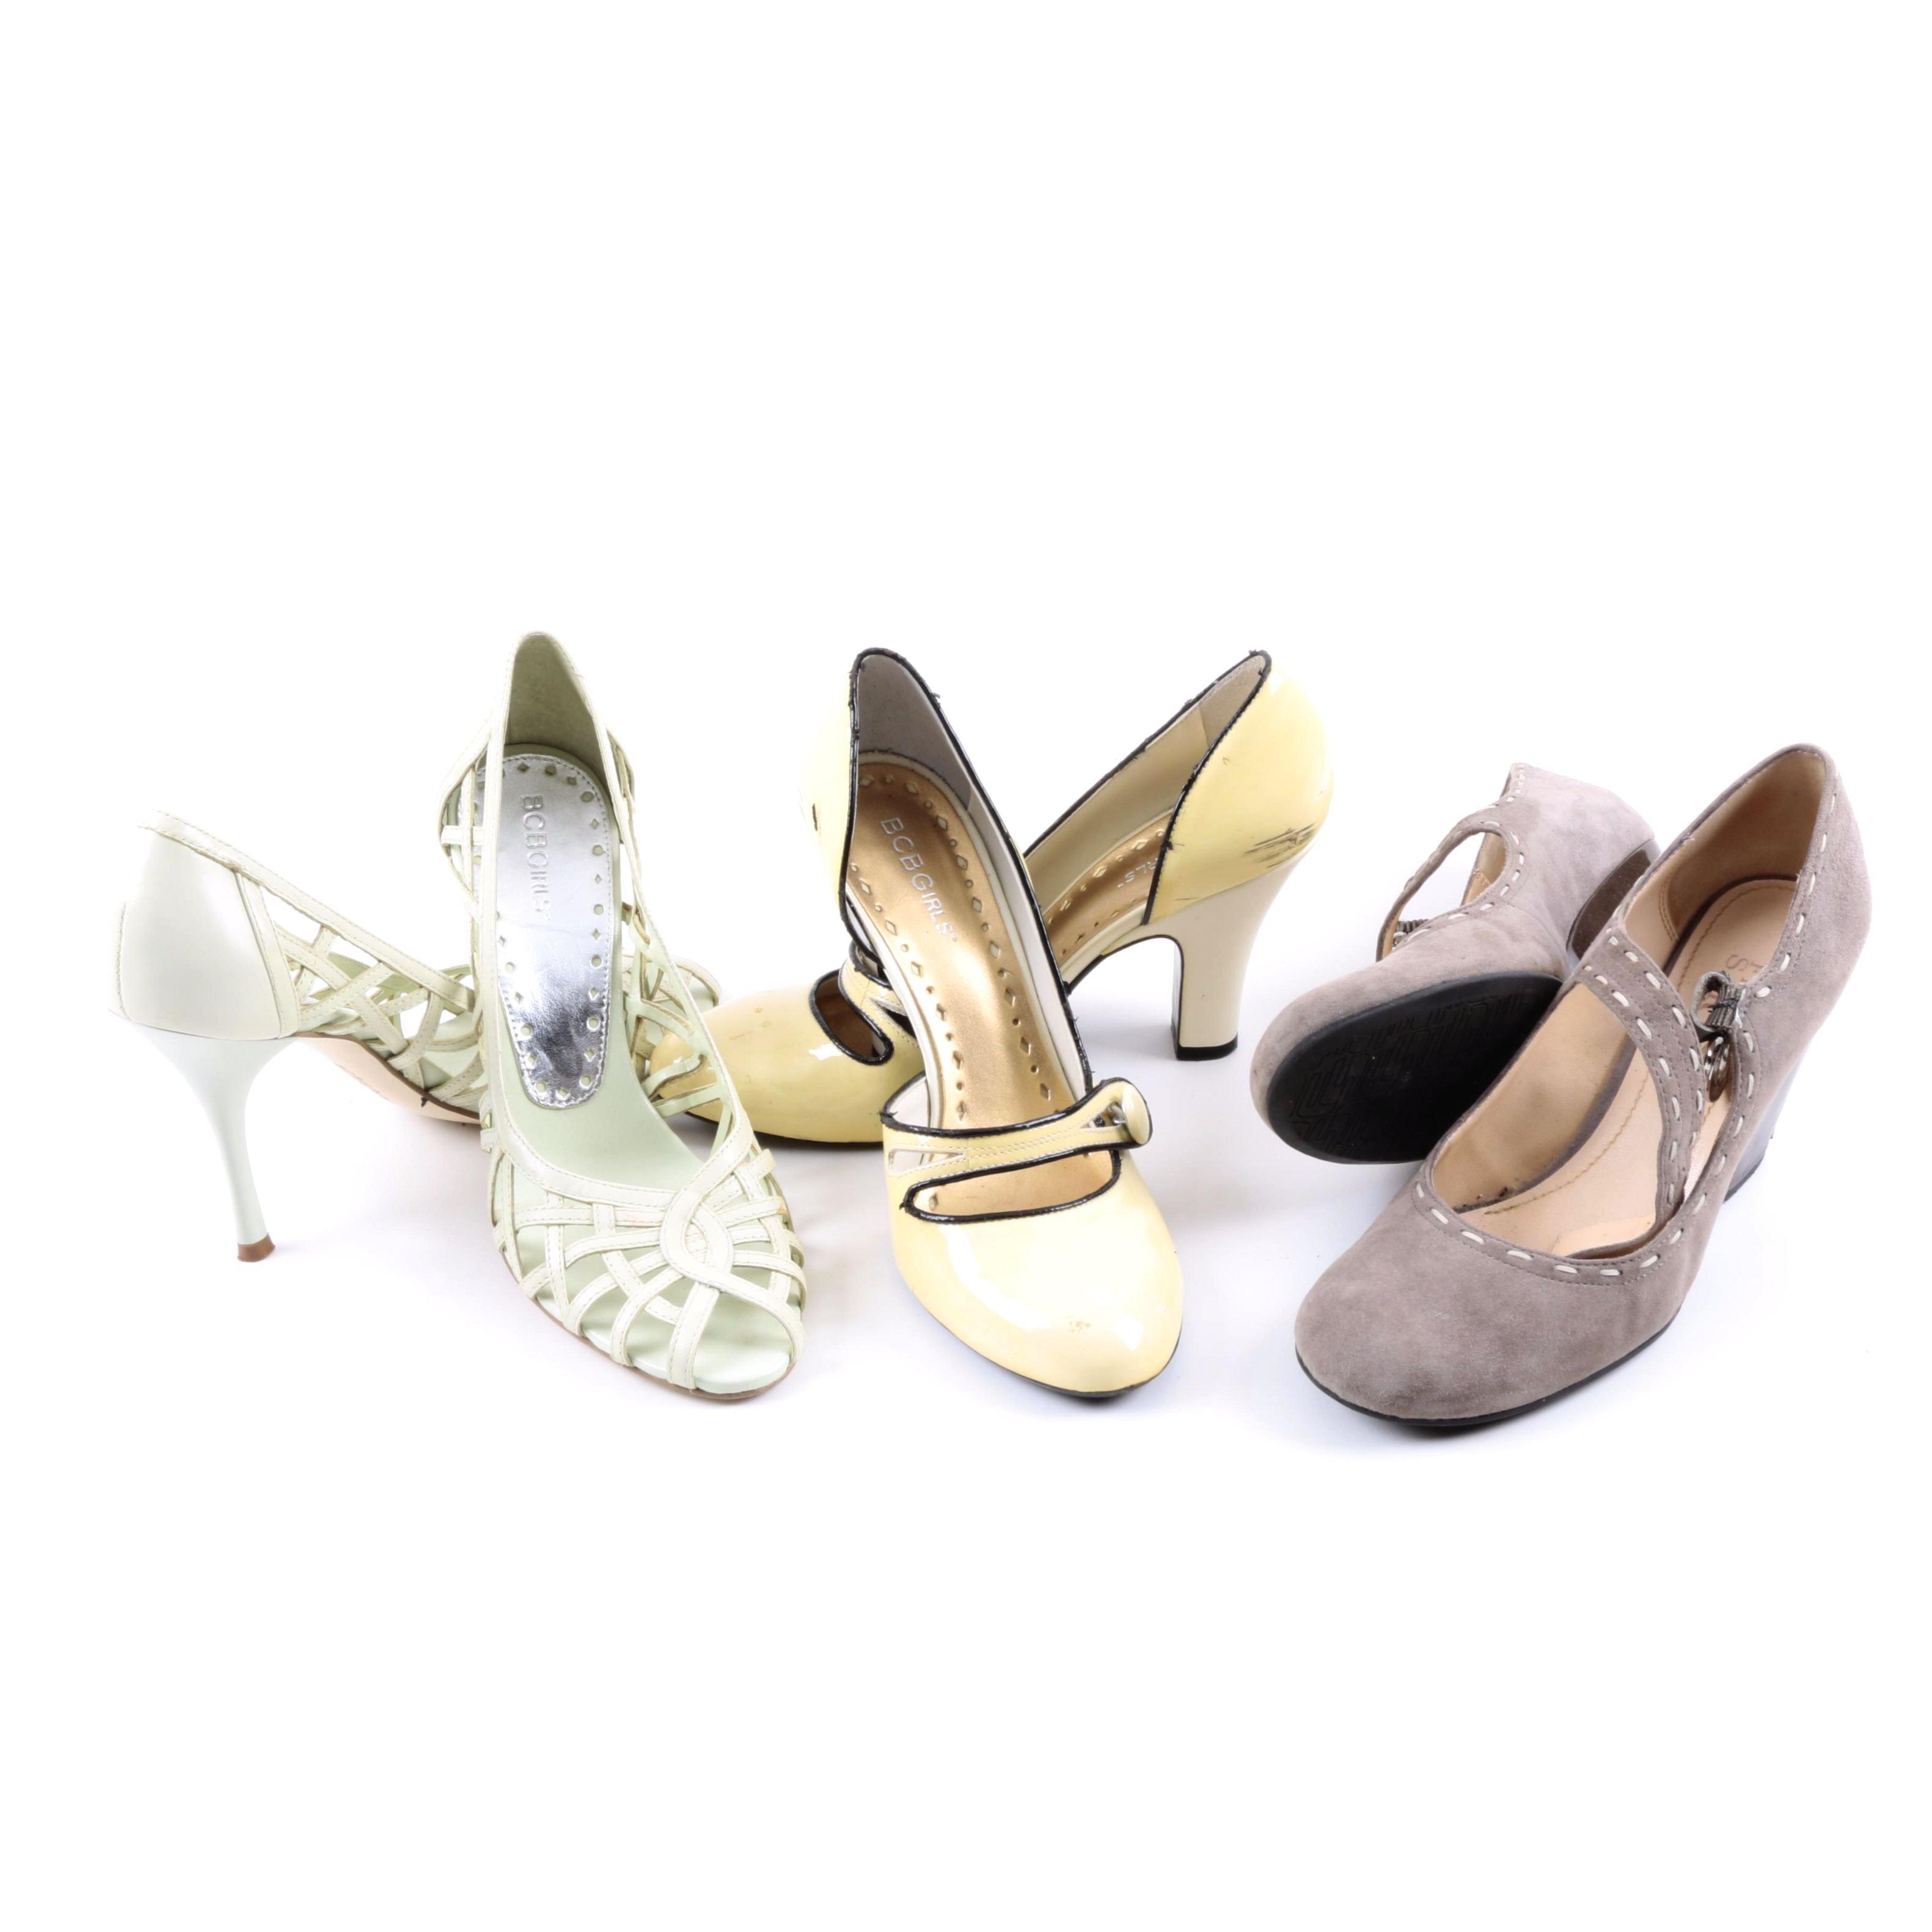 Women's Heel's Including Franco Sarto